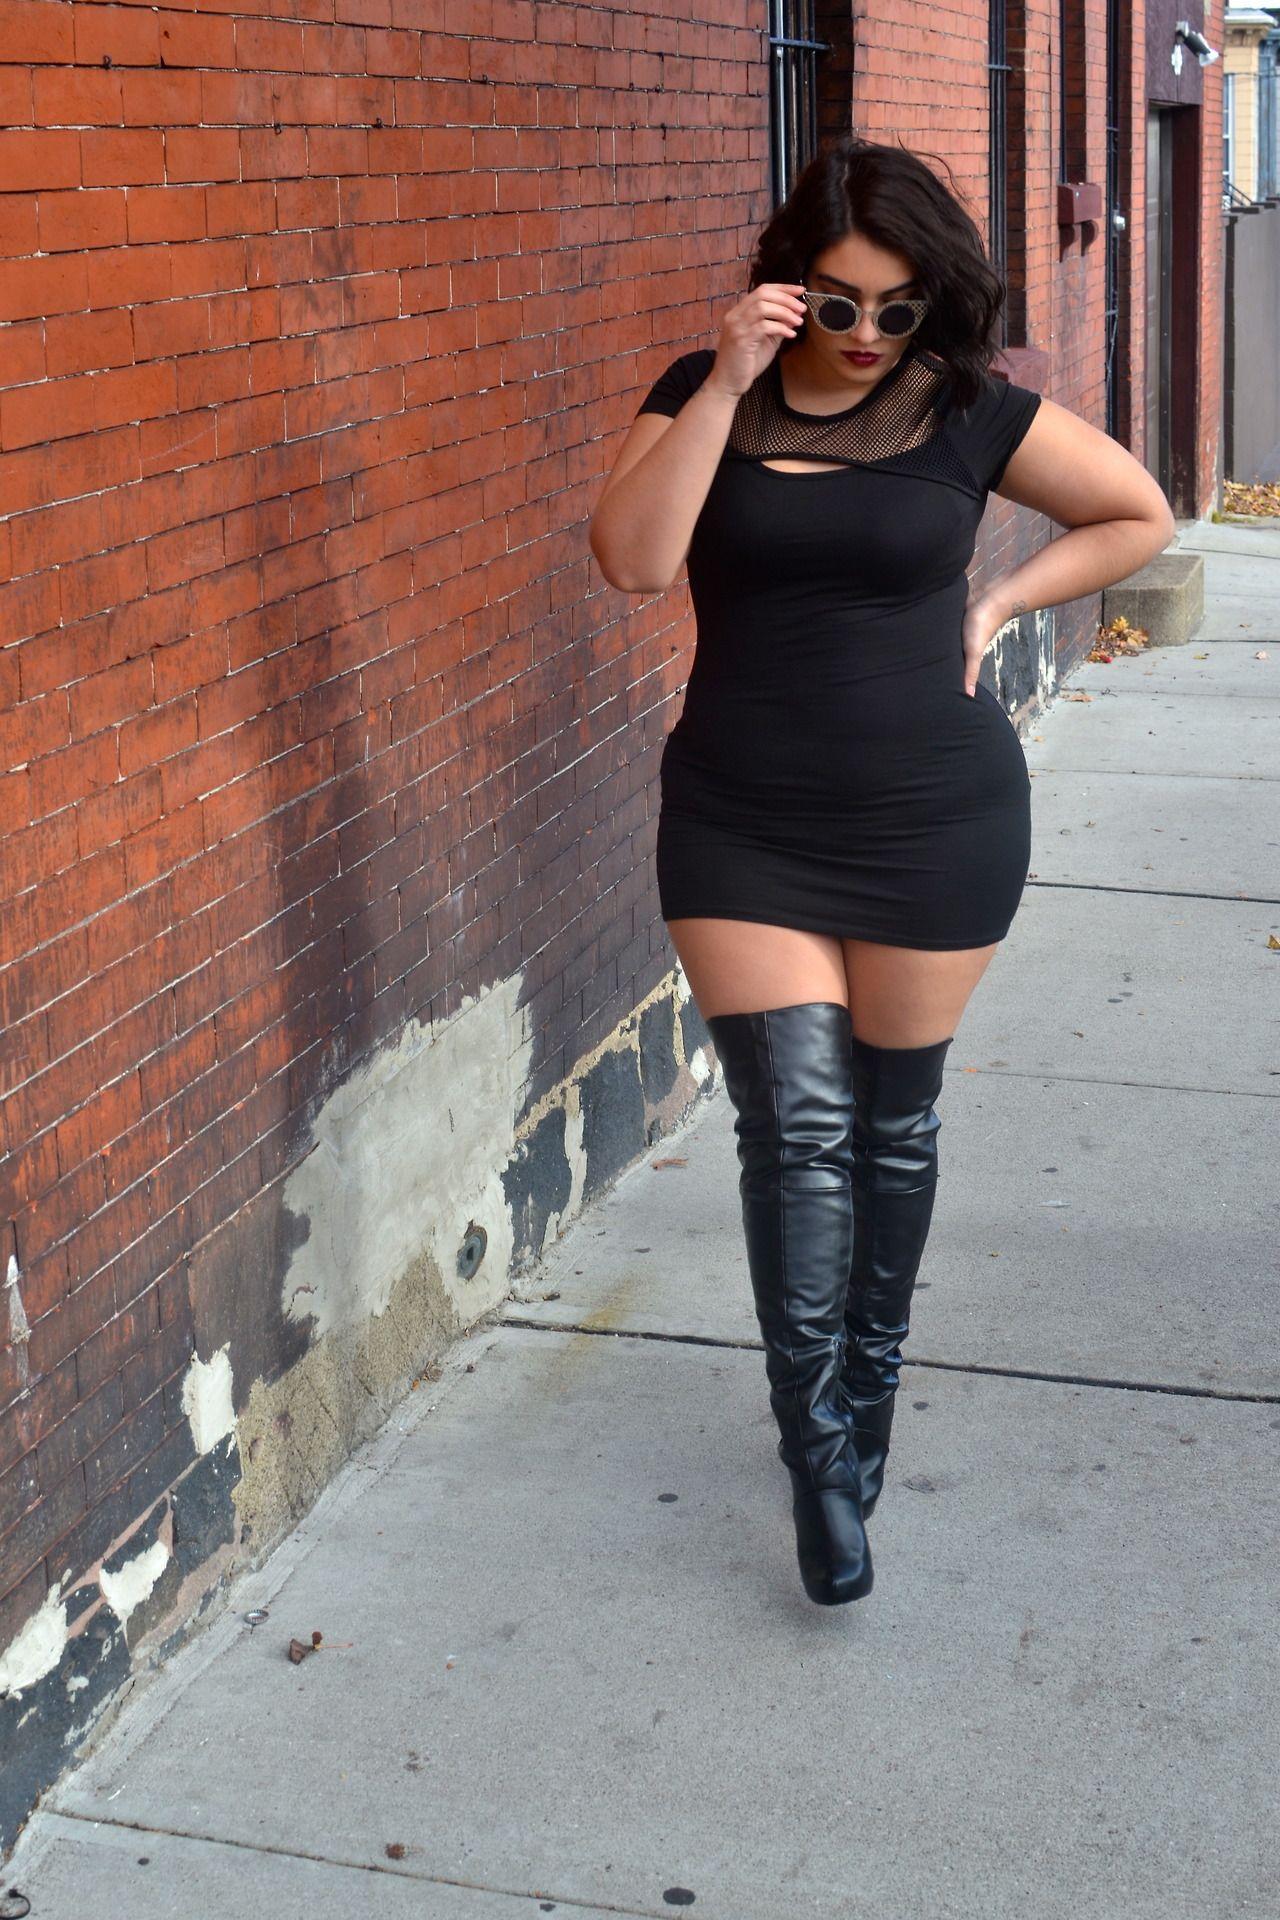 Curvy is the new black pretty girls fashion sexy plus size model